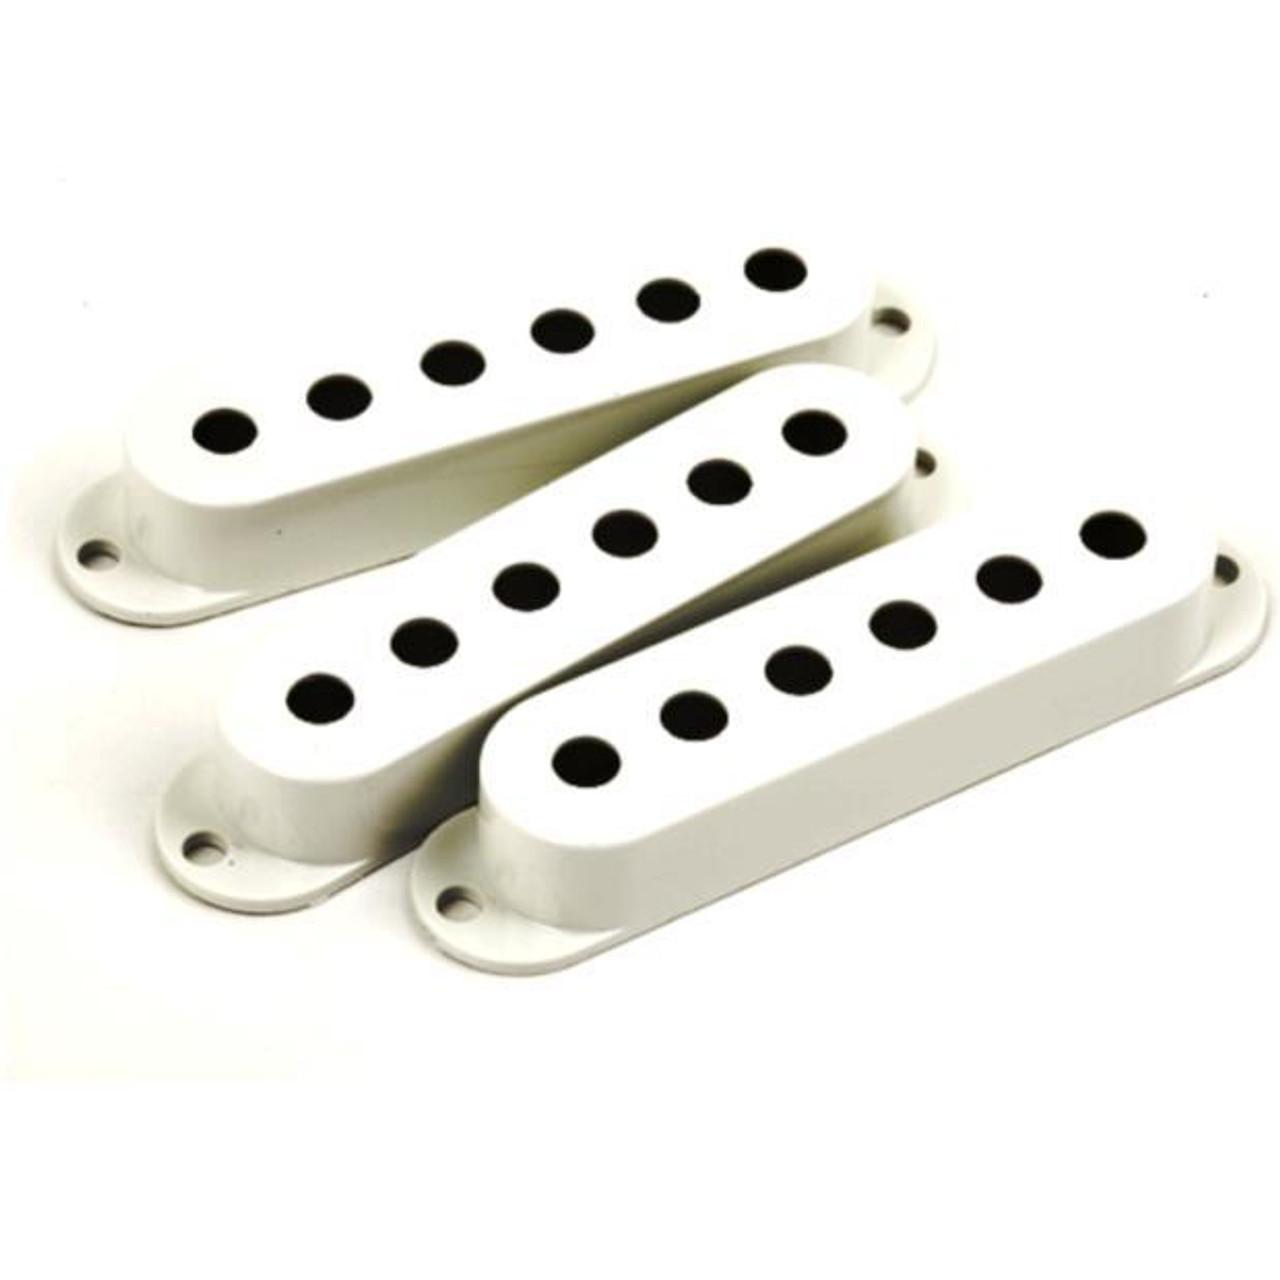 Fender Stratocaster Single Coil Pickup Covers-White